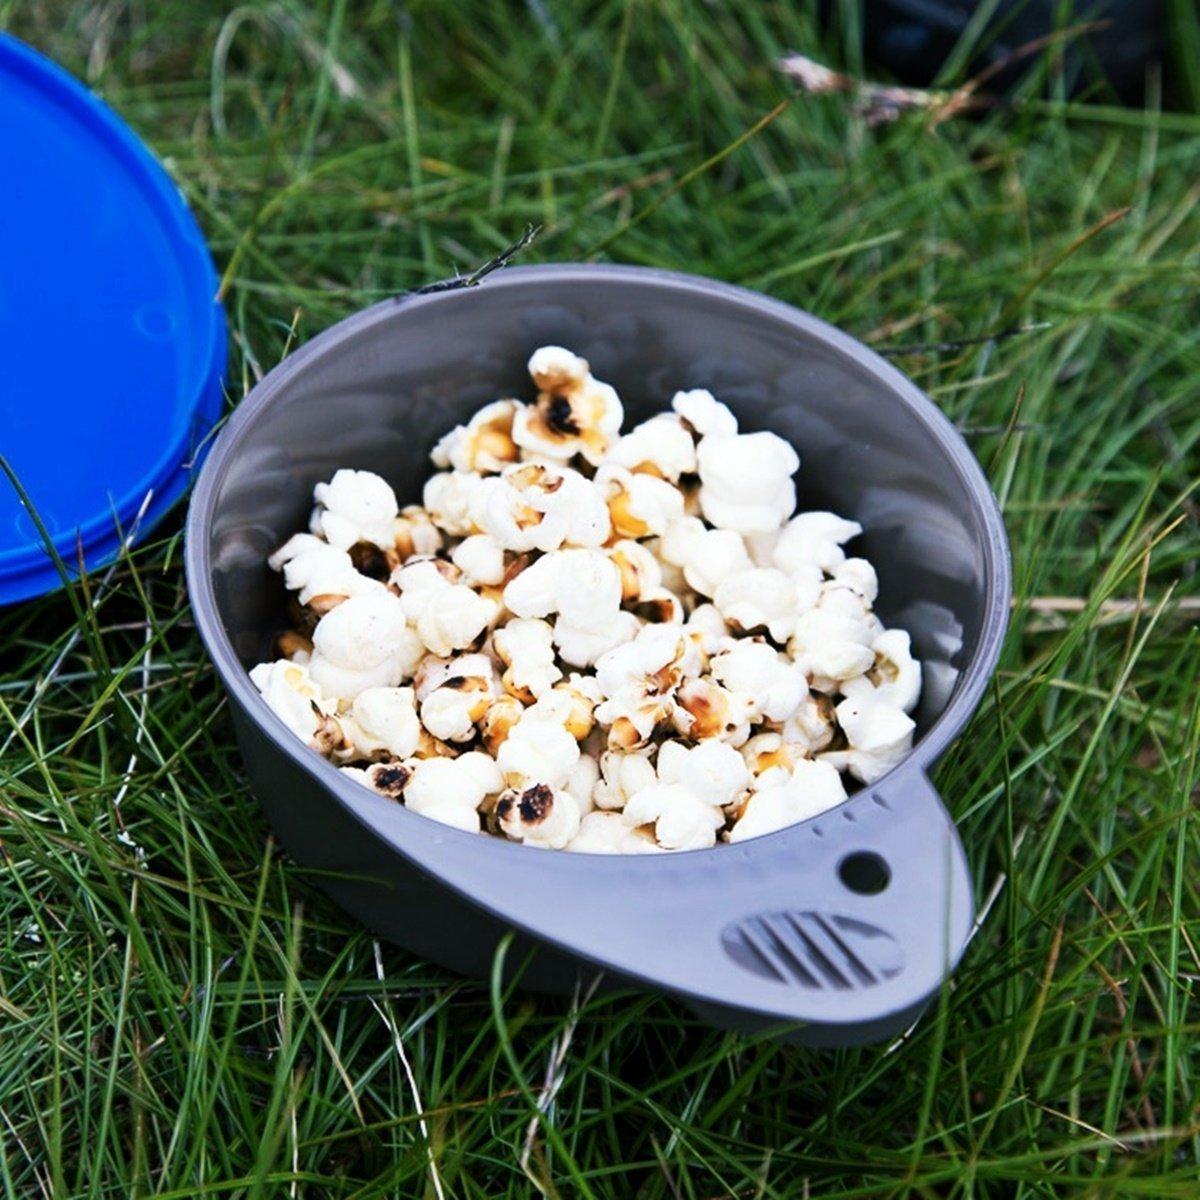 campin_popcorn_020